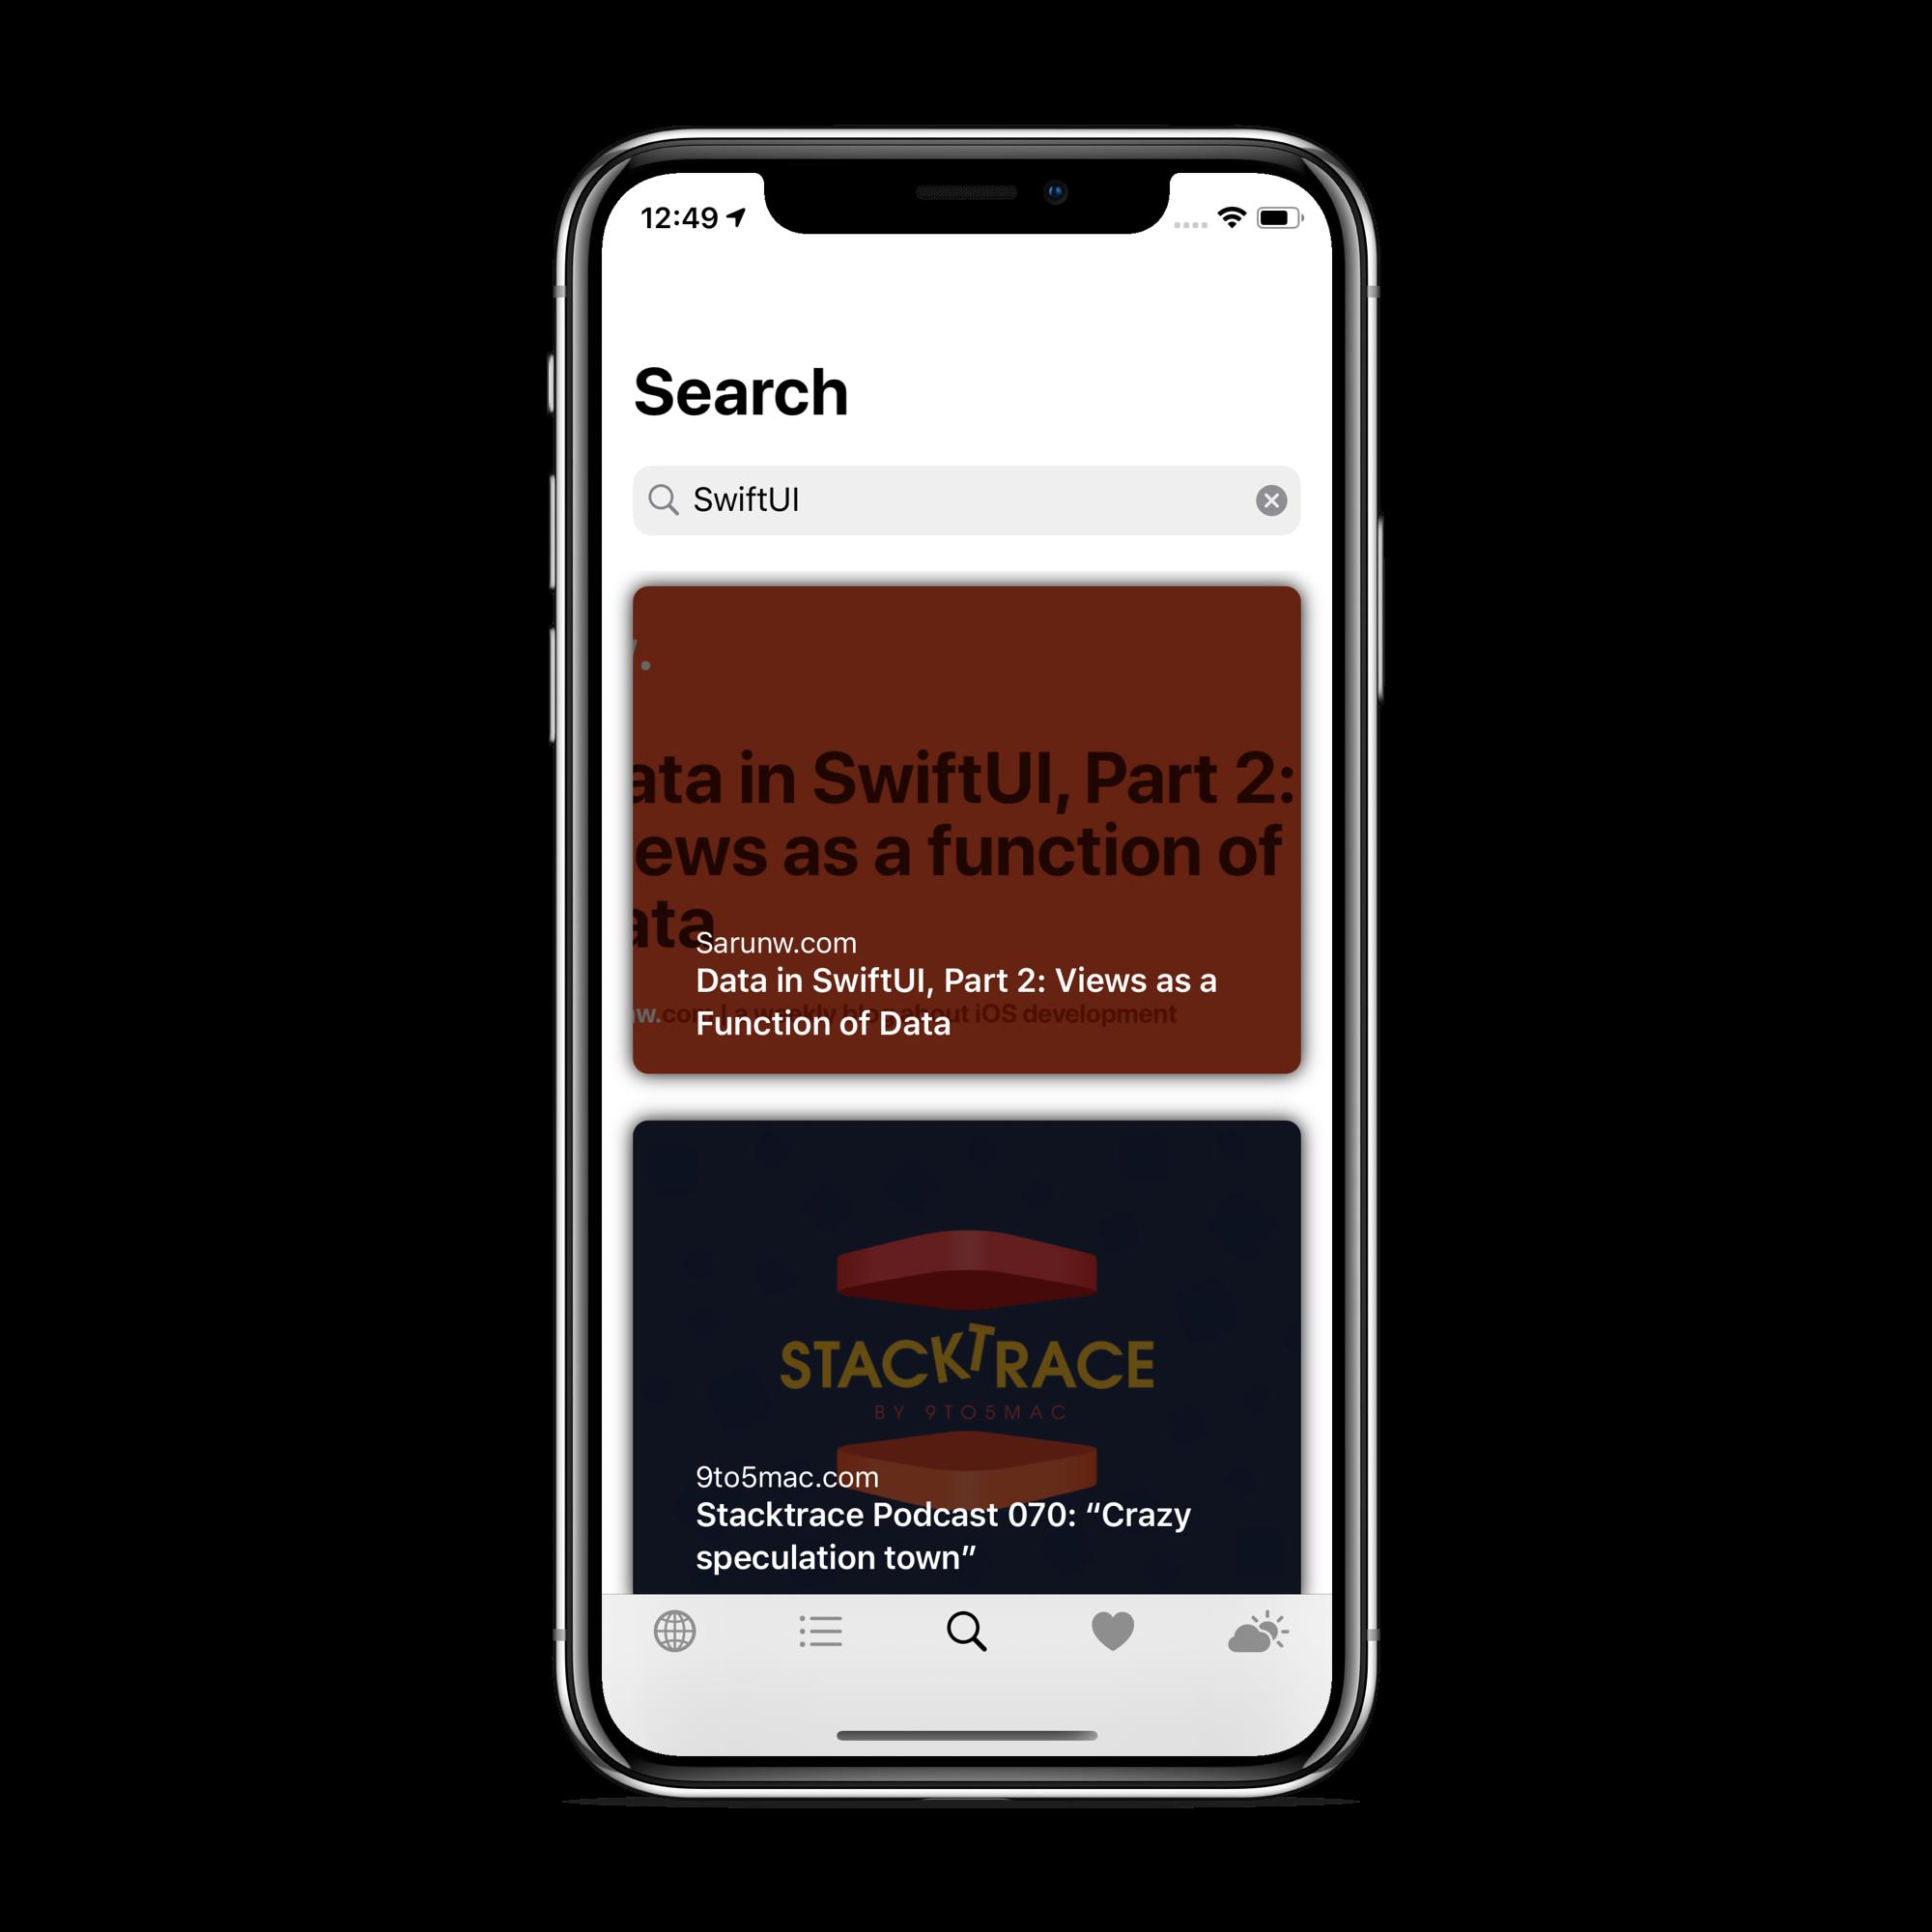 SearchForArticlesTab